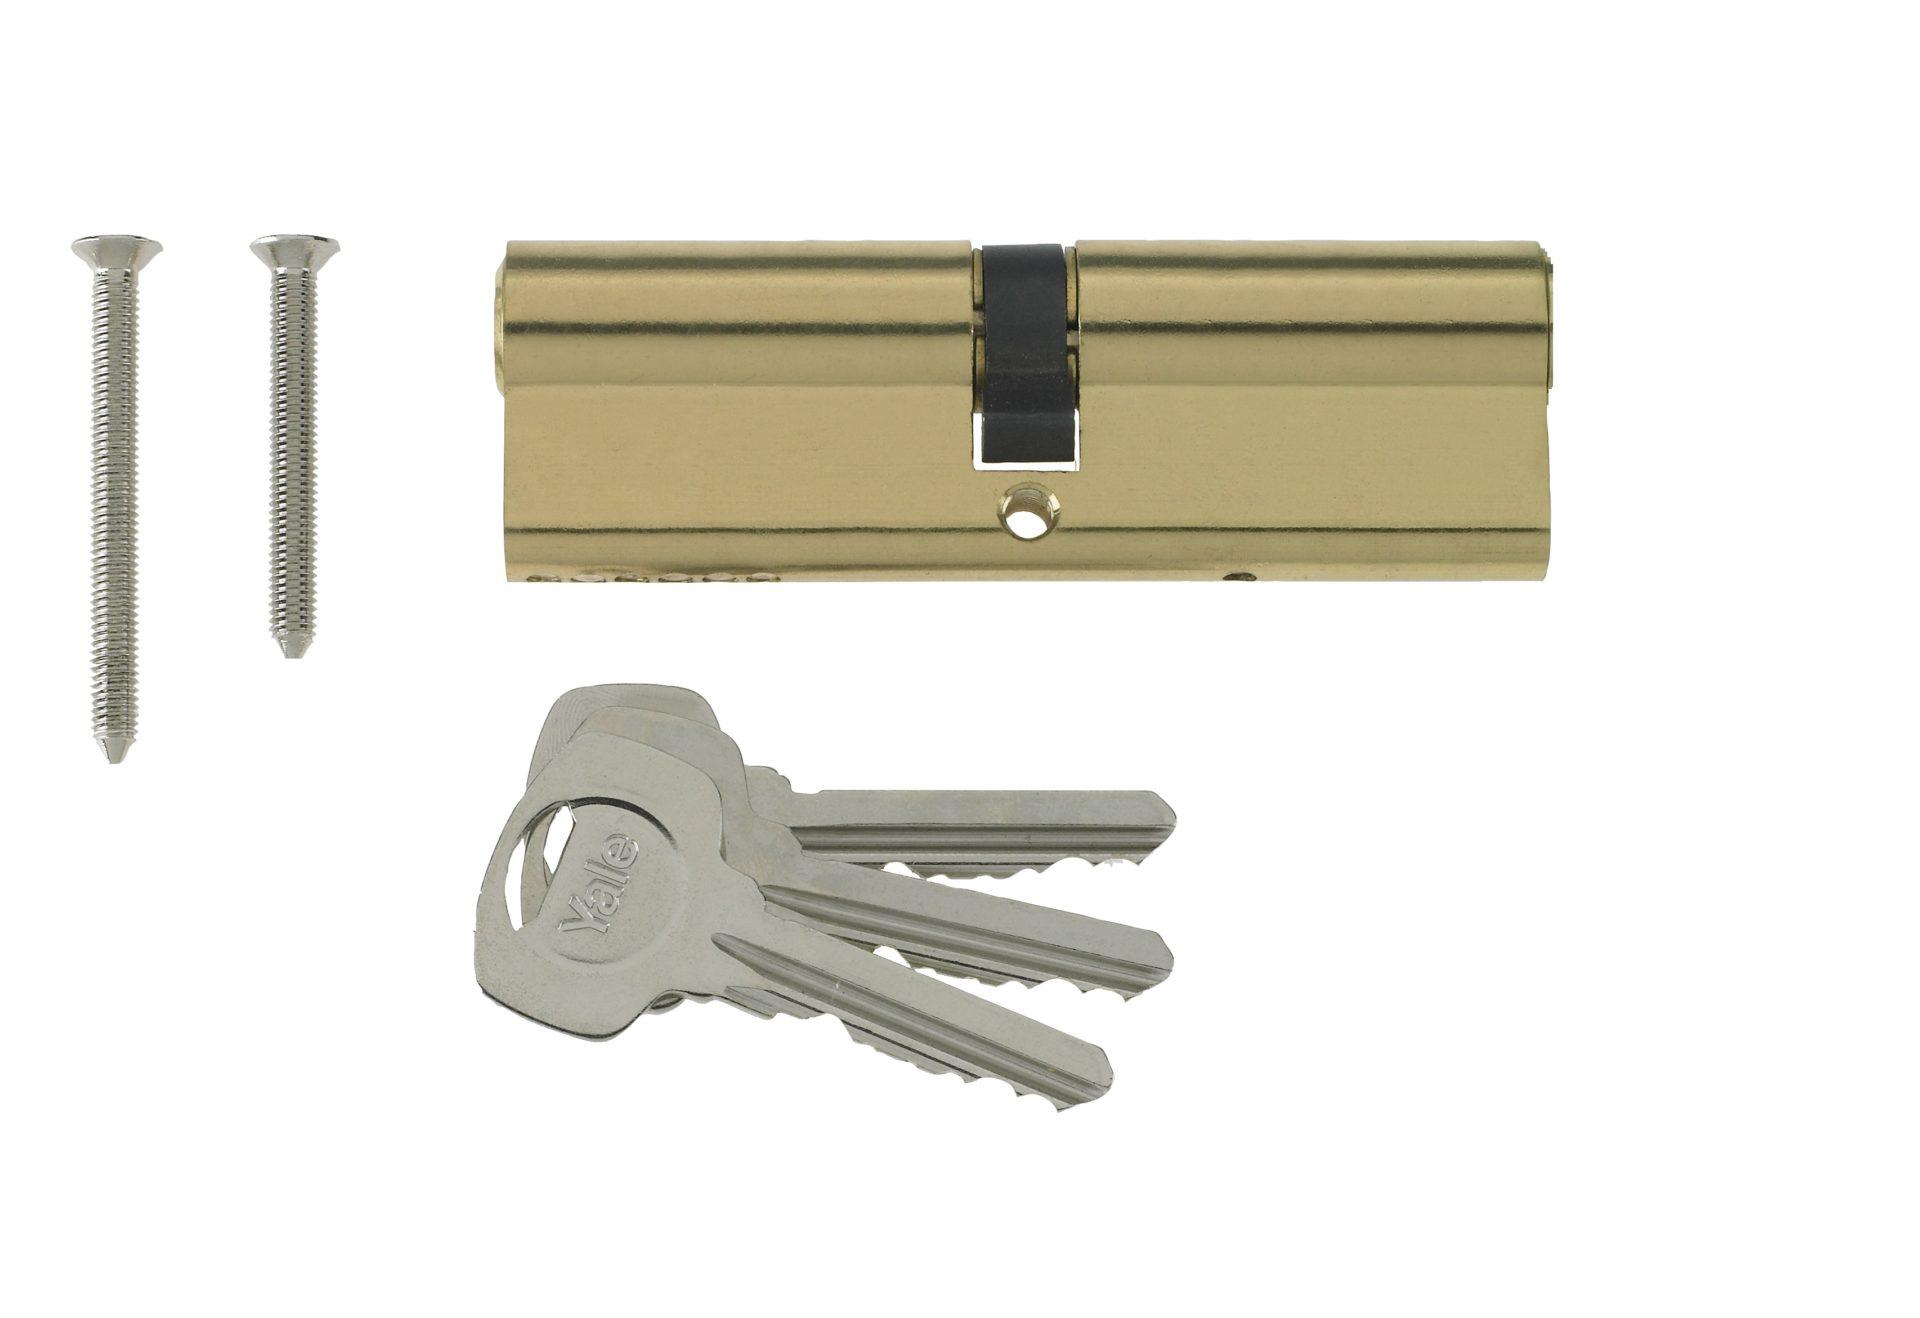 Yale 6 Pin Euro Profile Cylinder Lock Brass 40/40 (80mm) C/w 3 Keys